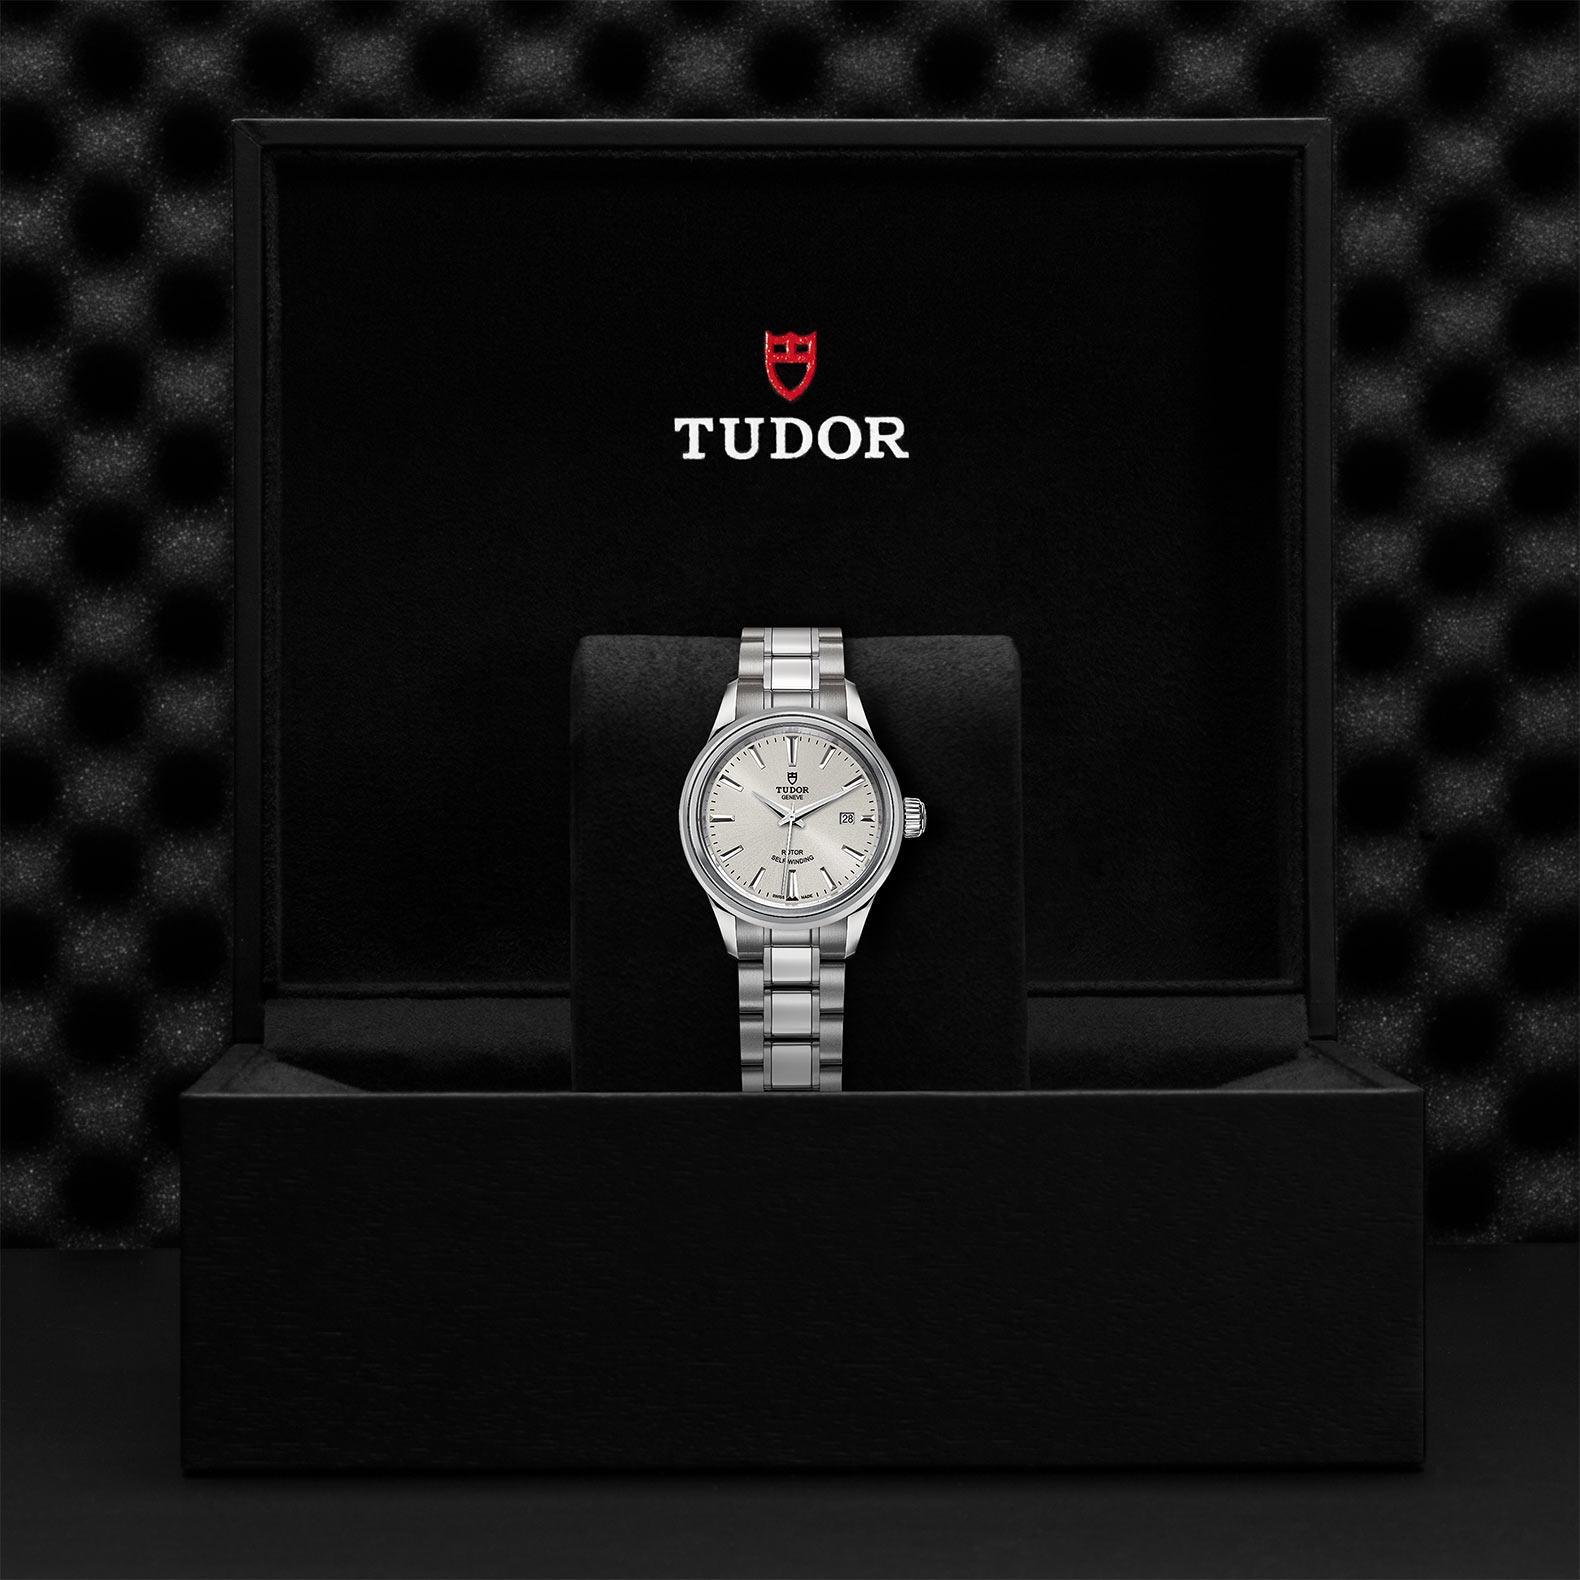 TUDOR Style M12100 0001 Presentation